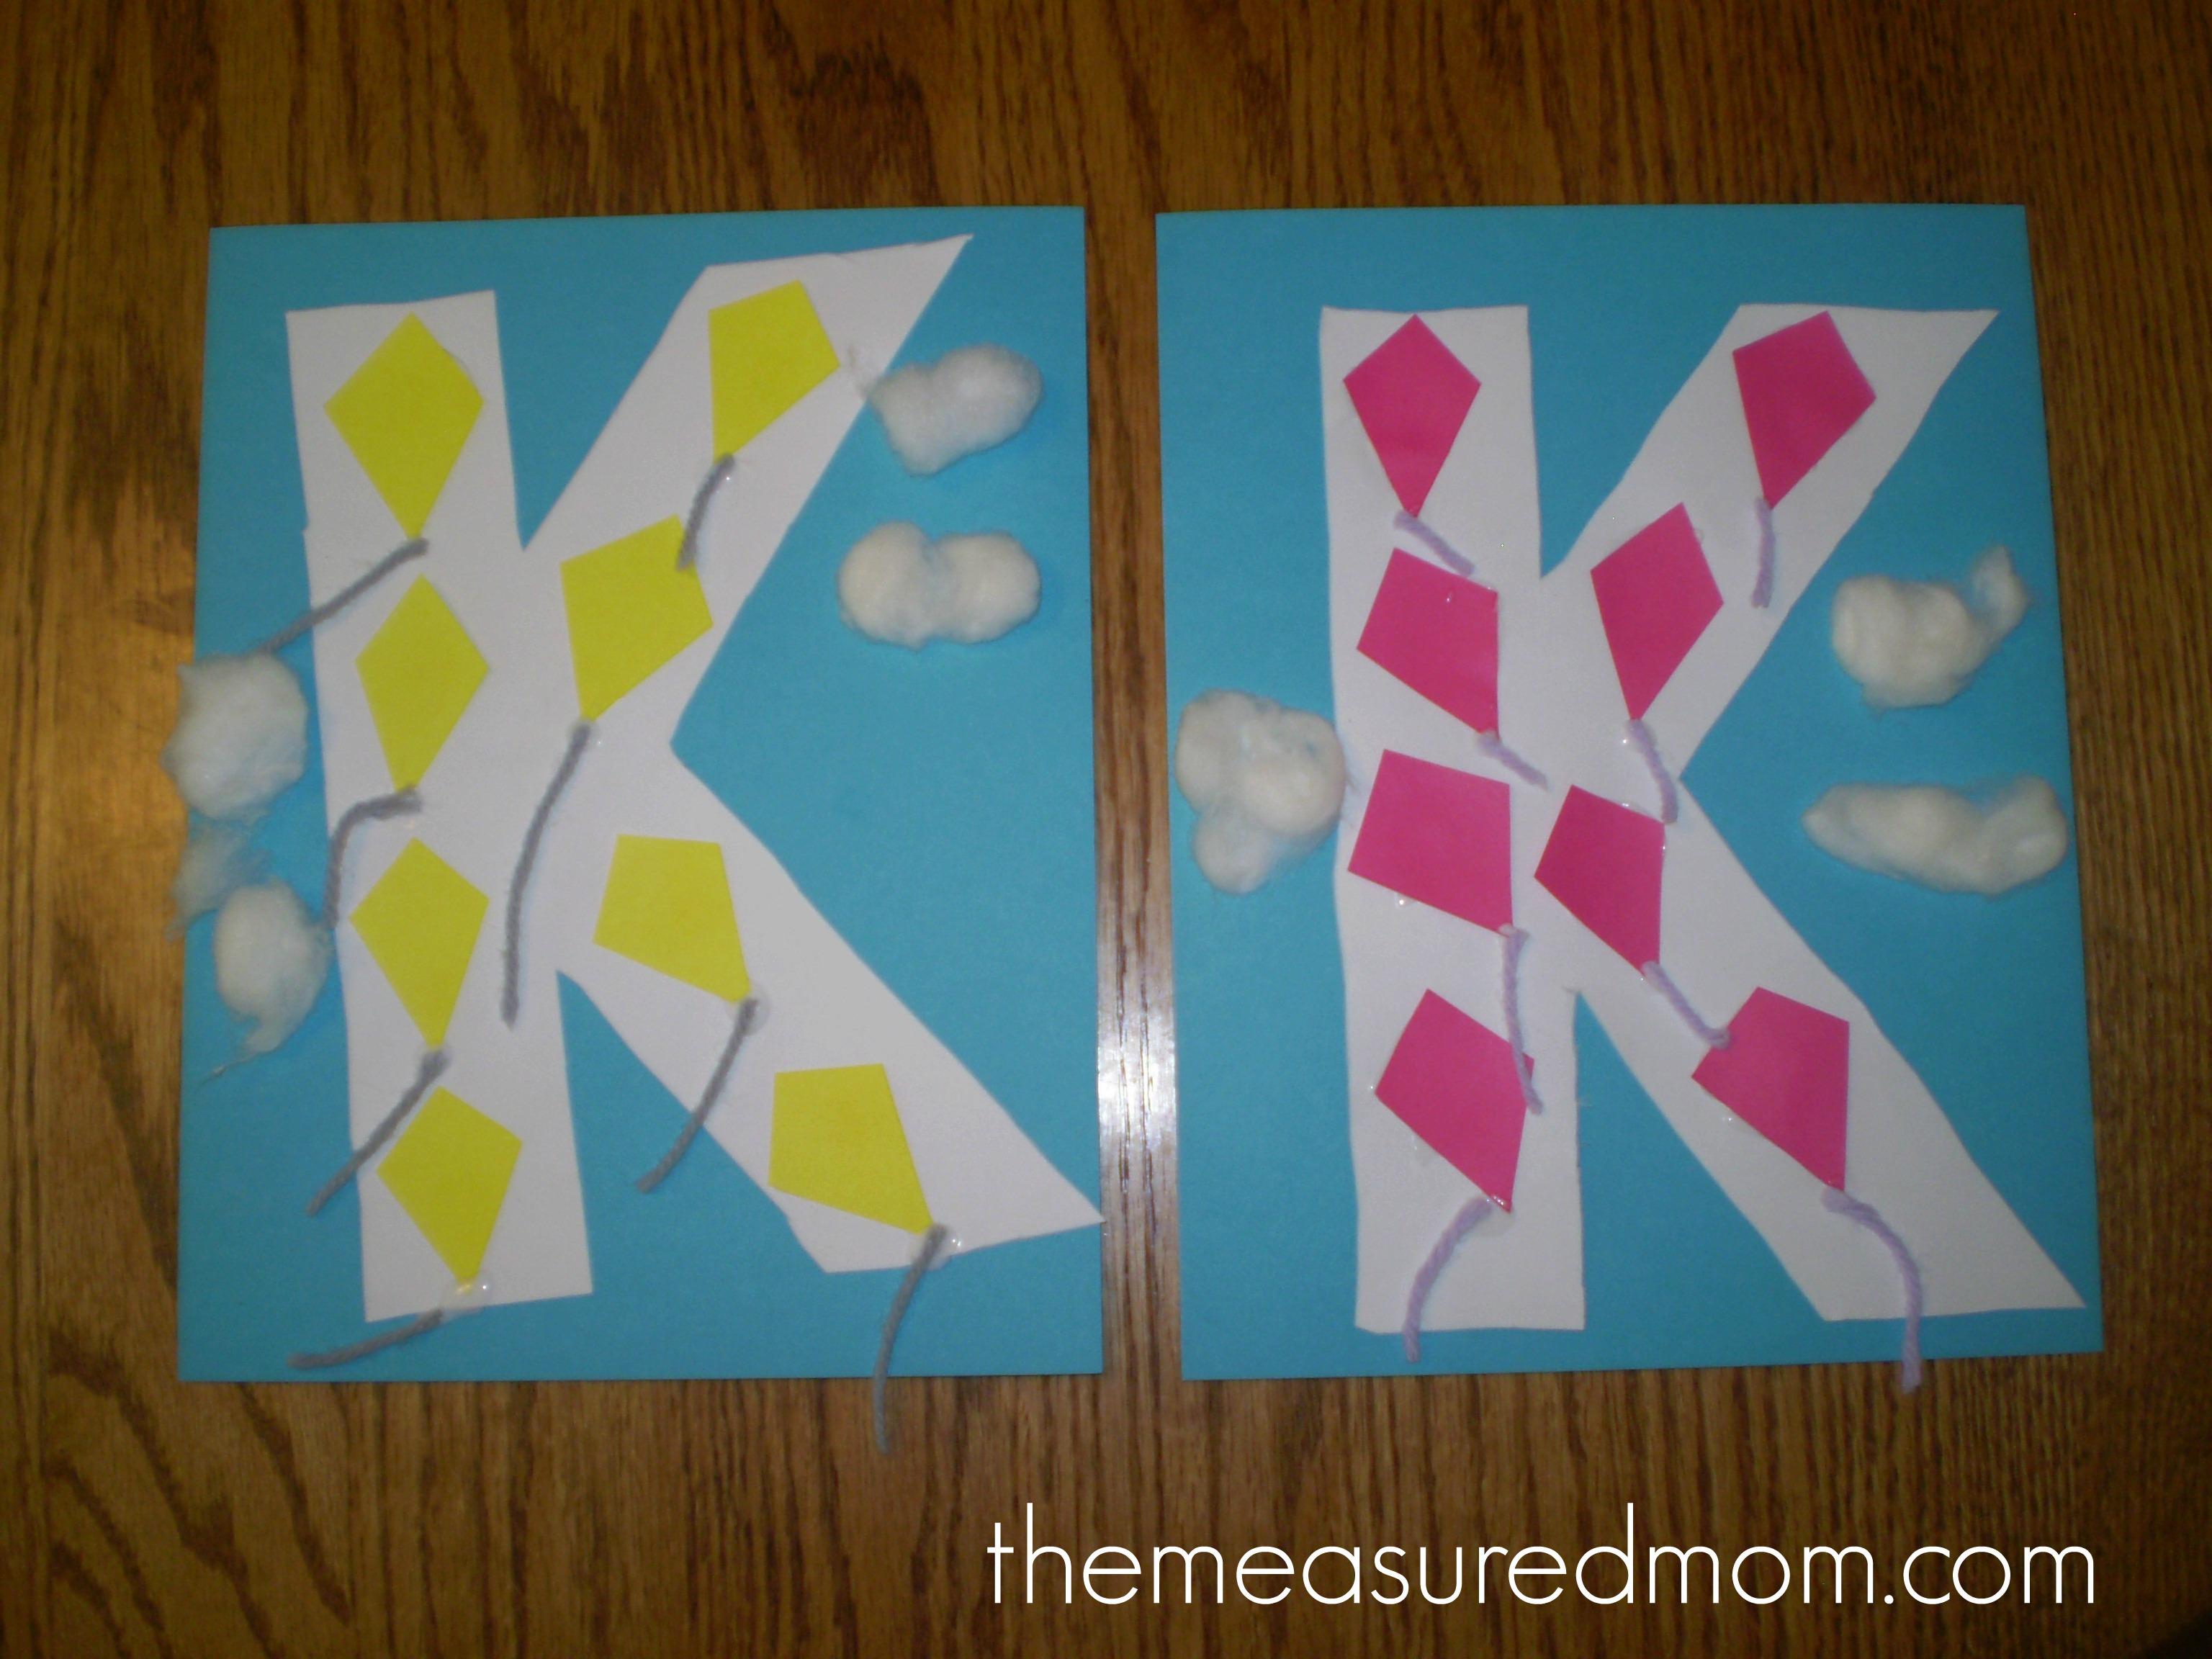 Crafts For Letter K The Measured Mom